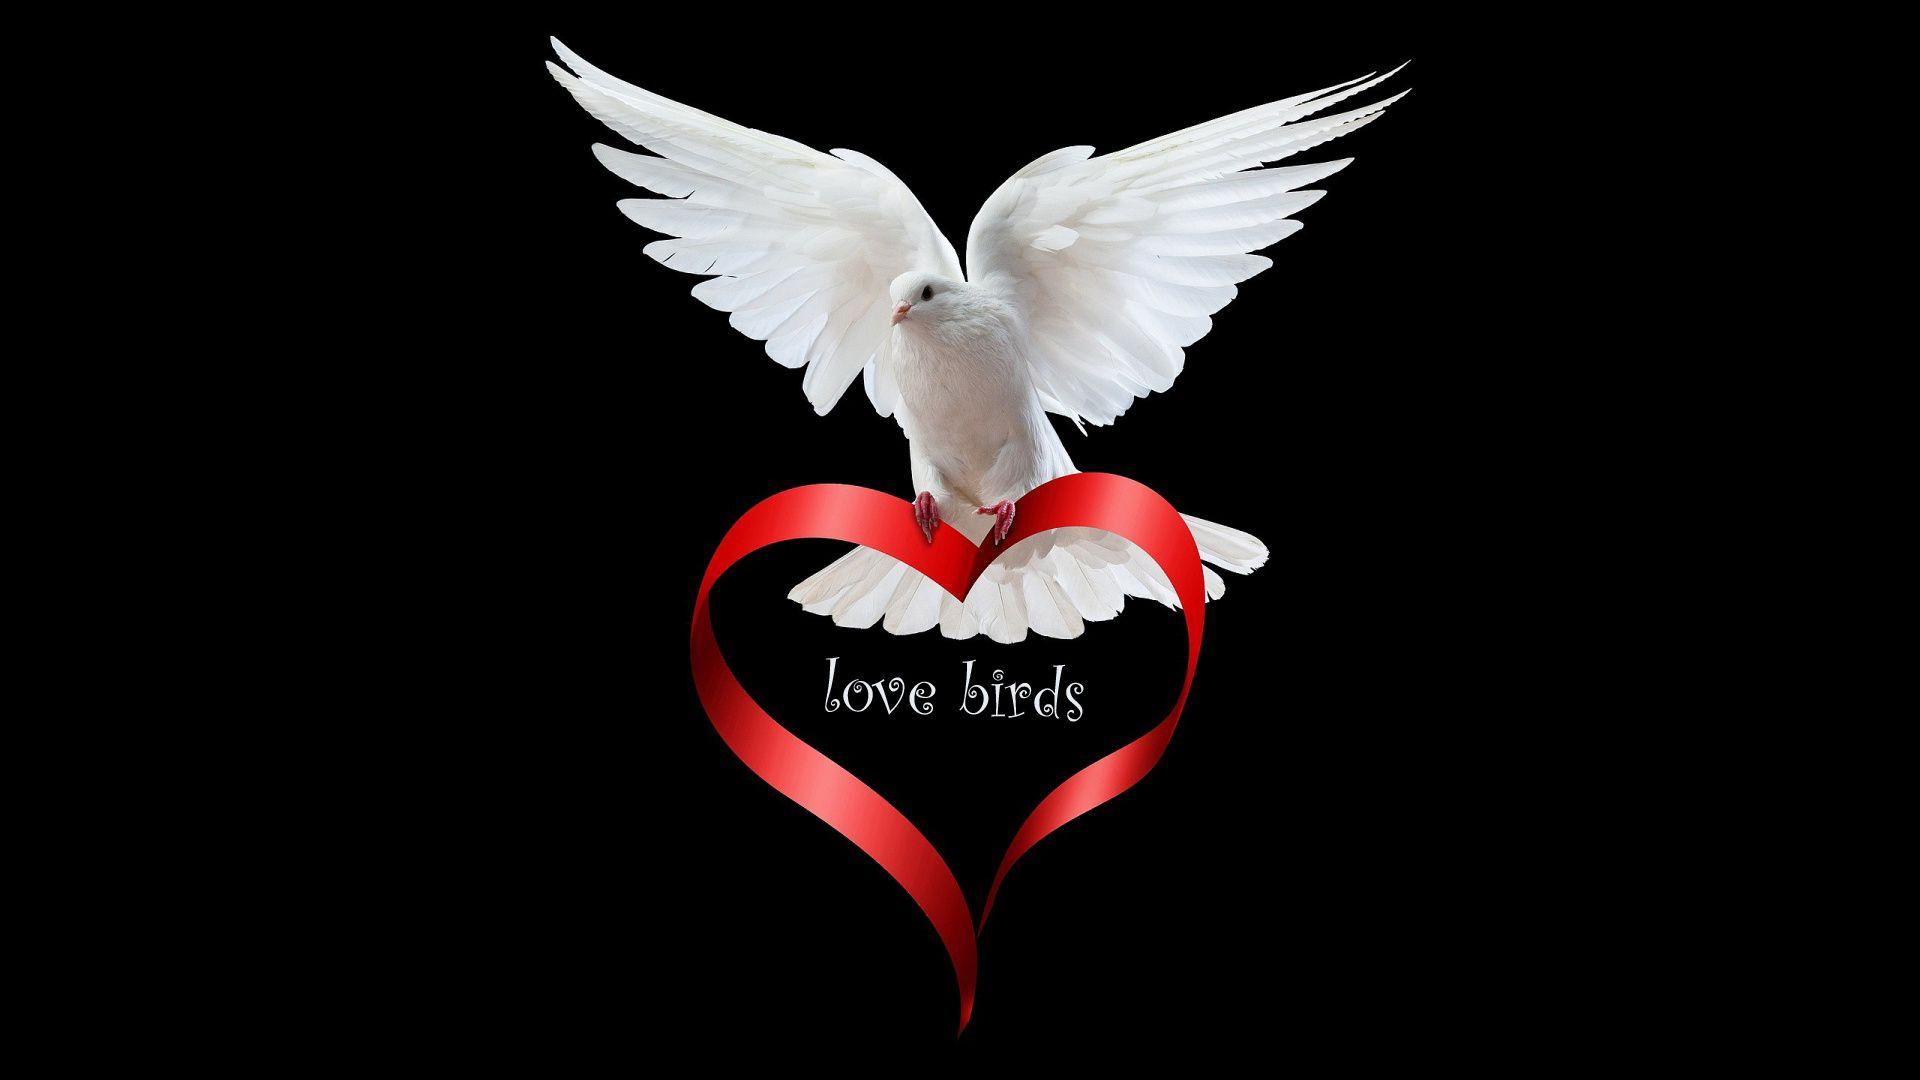 cute-love-birds-Odd-wallpaper-wpc5803841